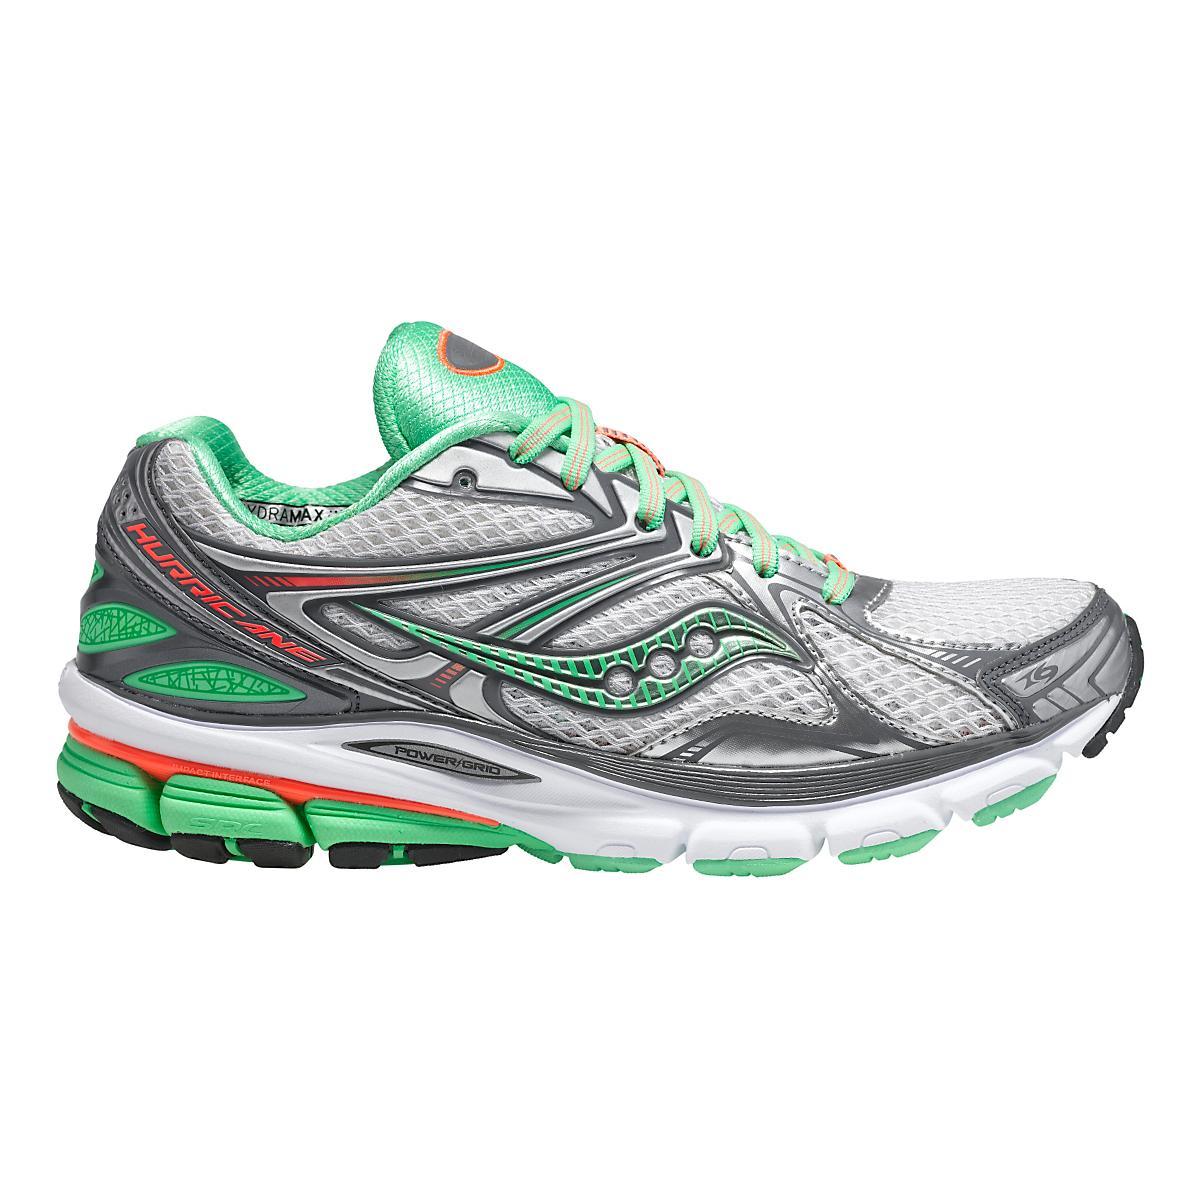 73841265ec11 Womens Saucony Hurricane 16 Running Shoe at Road Runner Sports